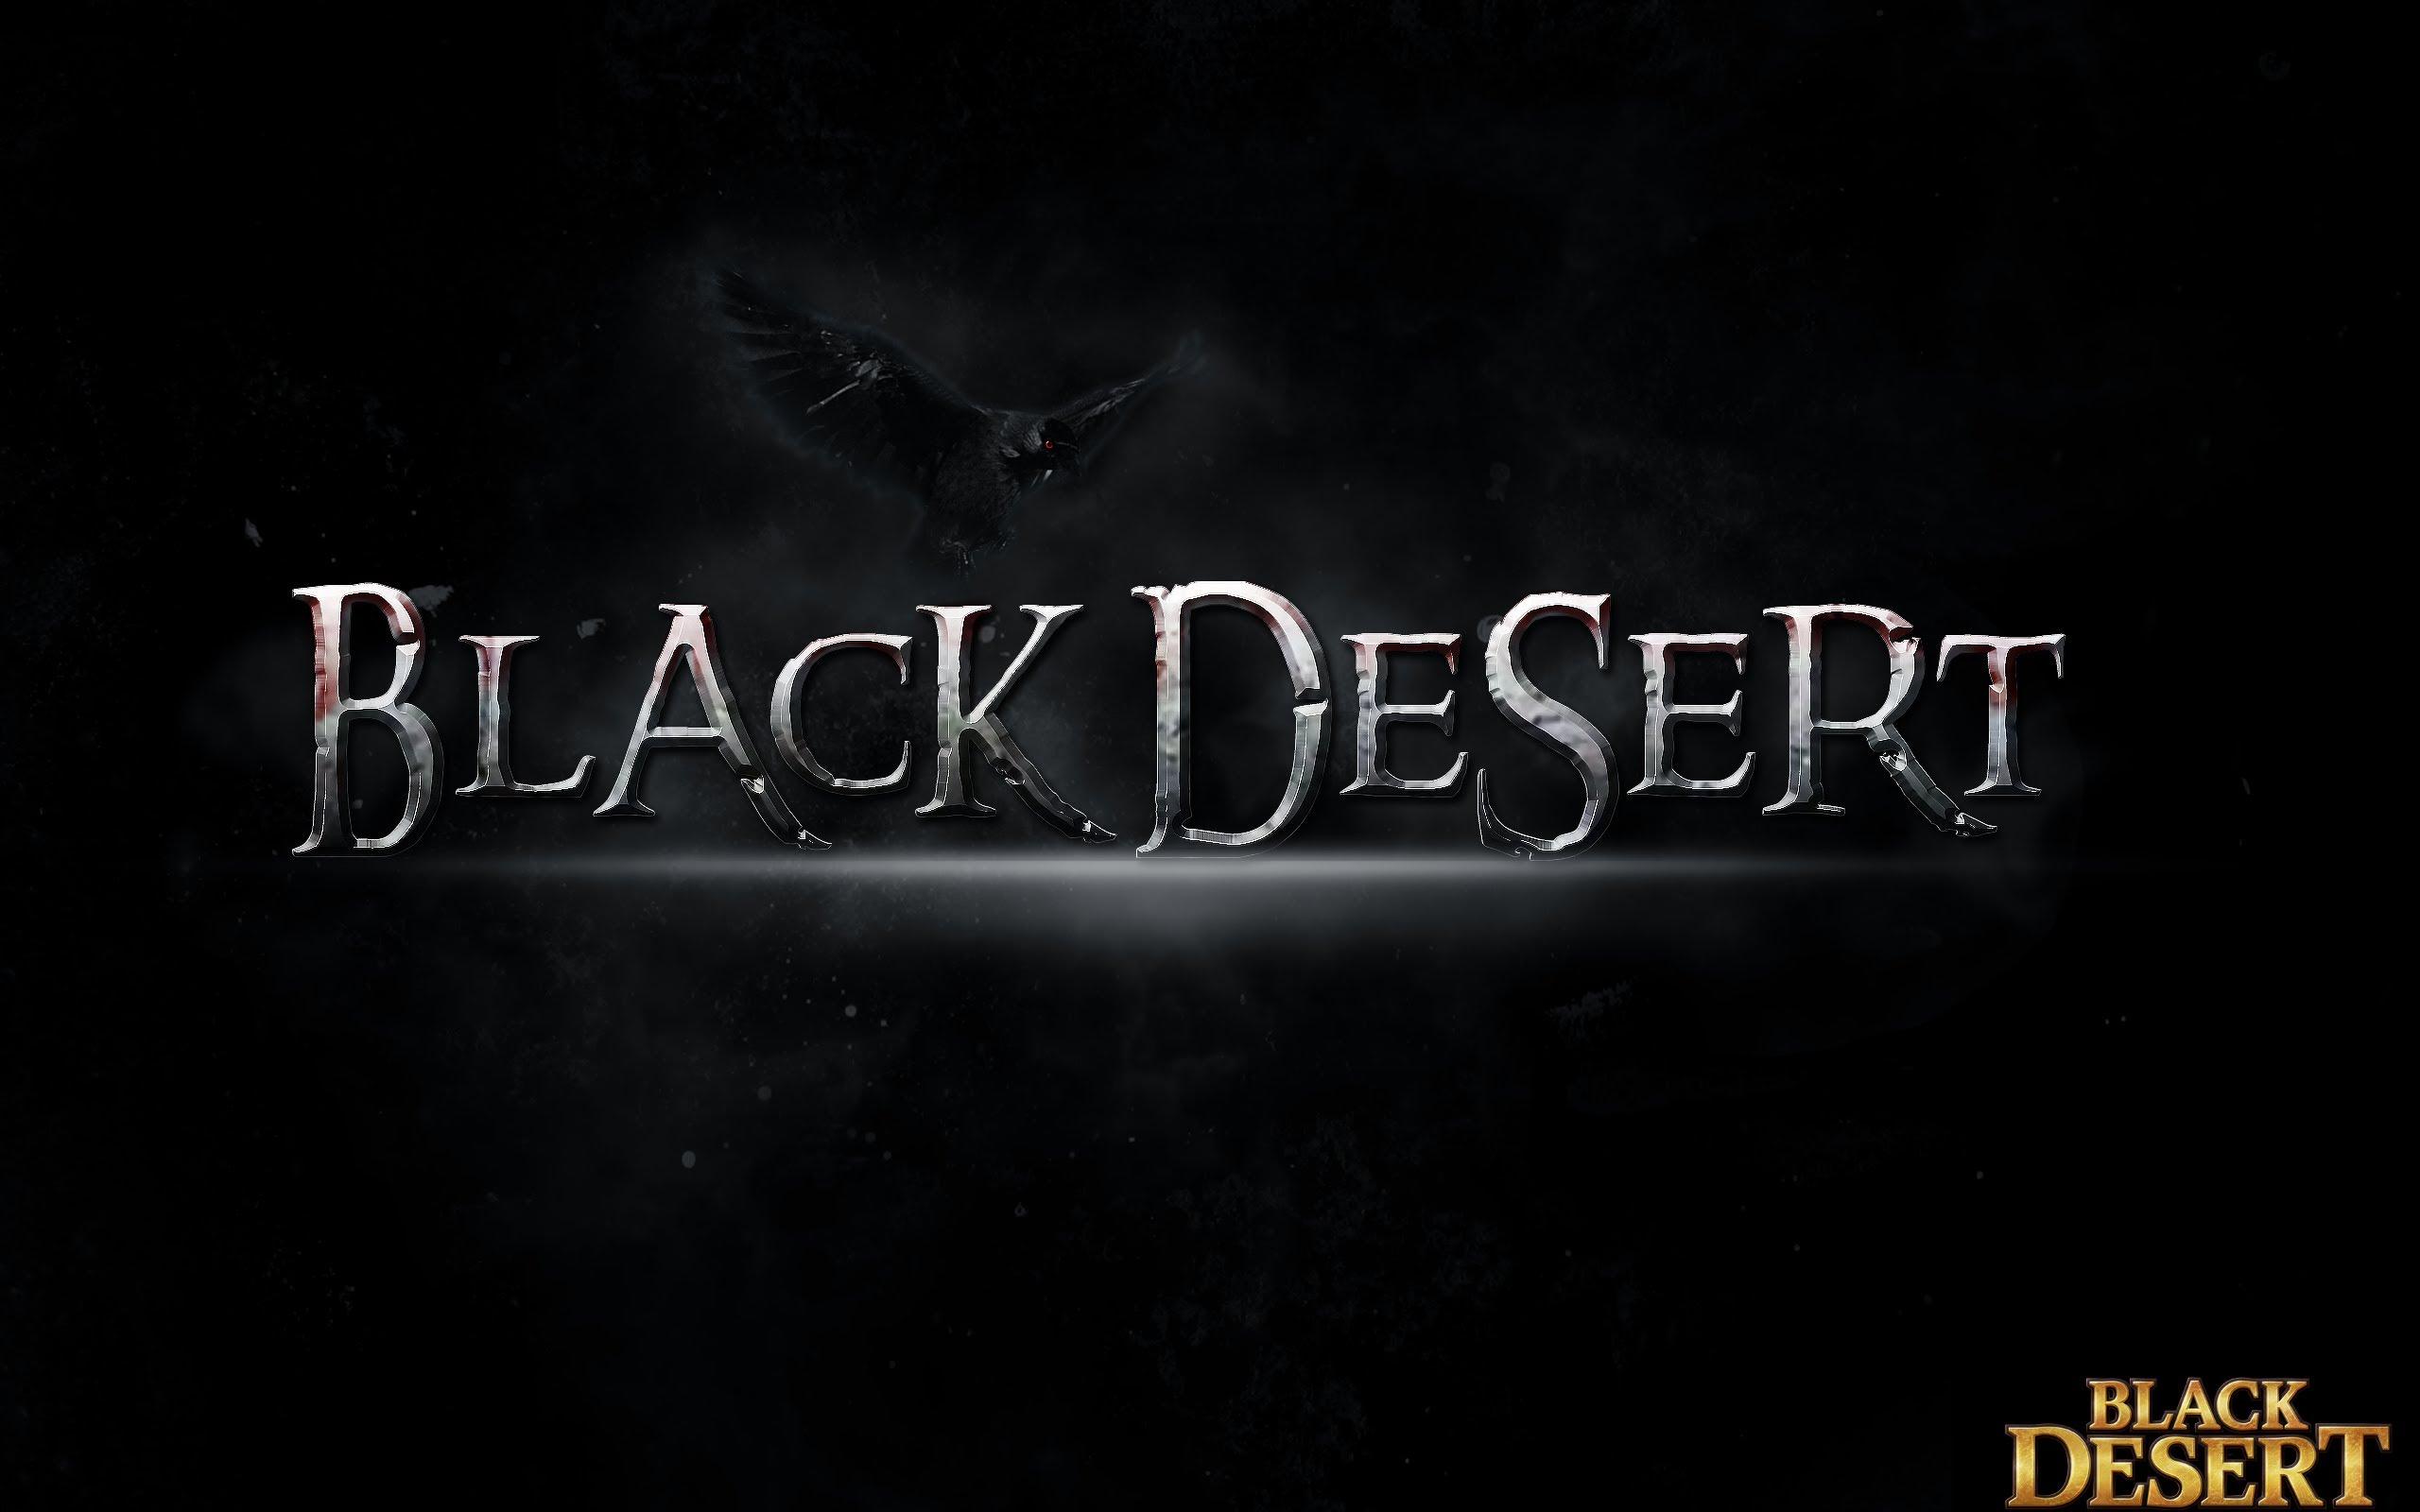 Black Screen Wallpaper Black Desert Hd Backgrounds Pixelstalk Net